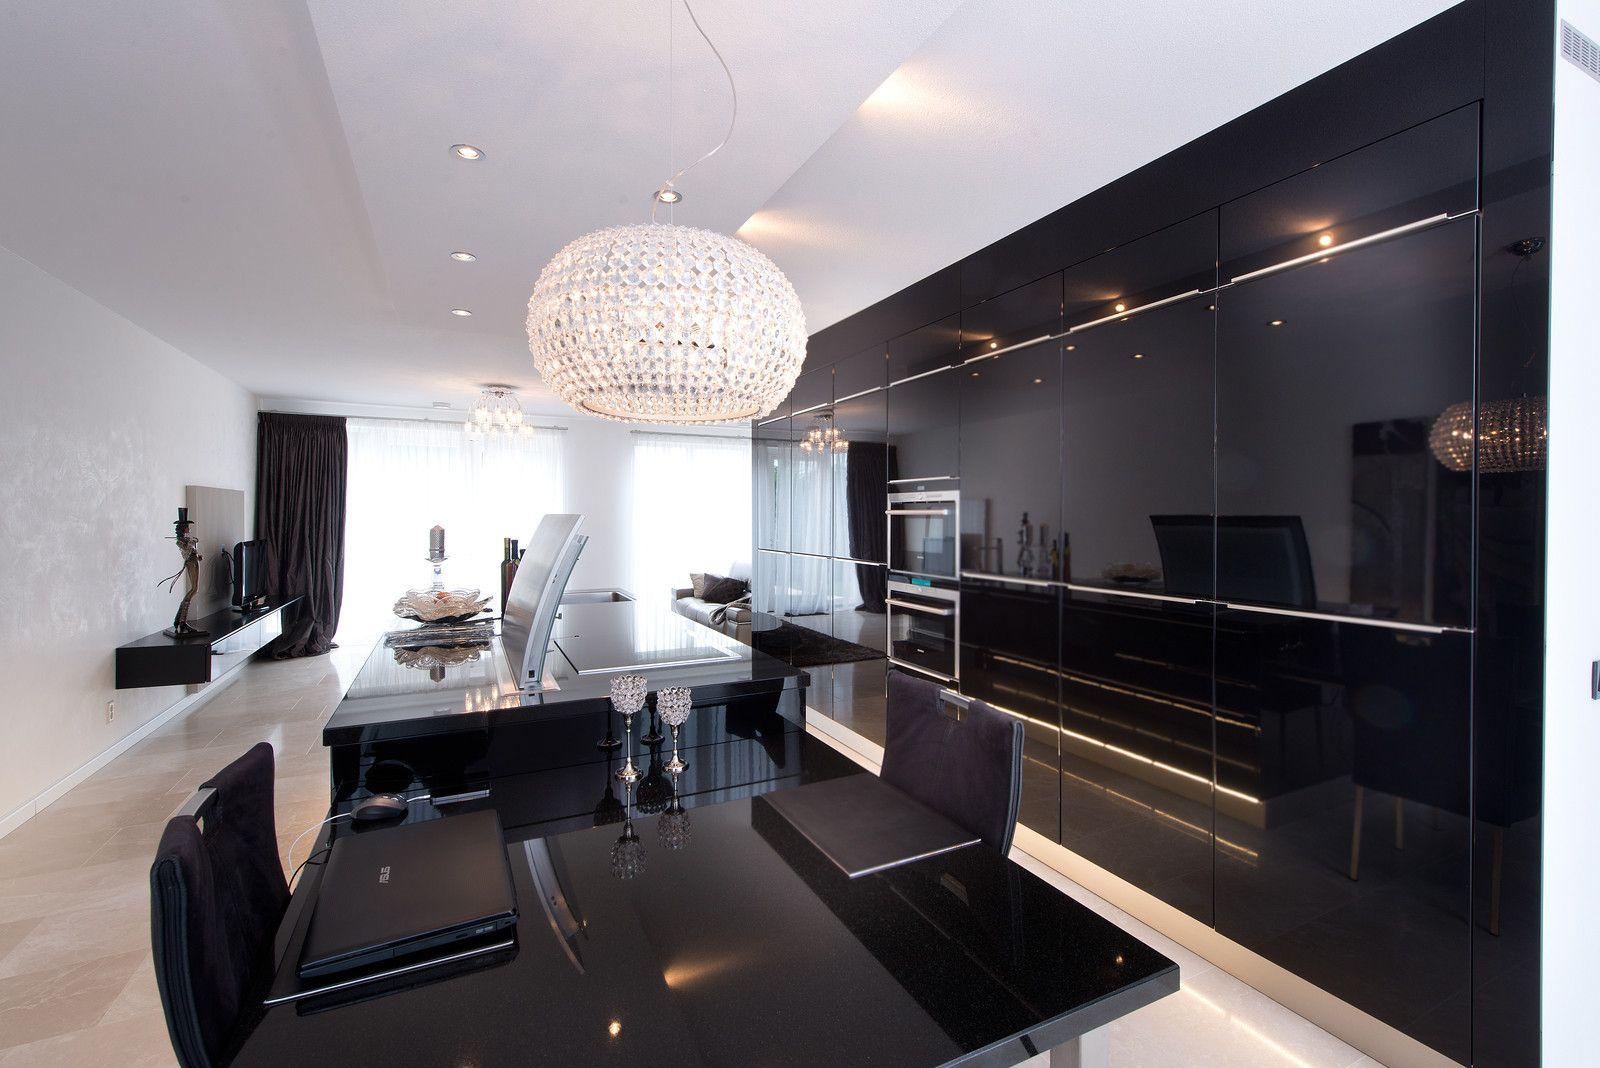 Tieleman keuken model next hoogglans zwart gelakt kopen